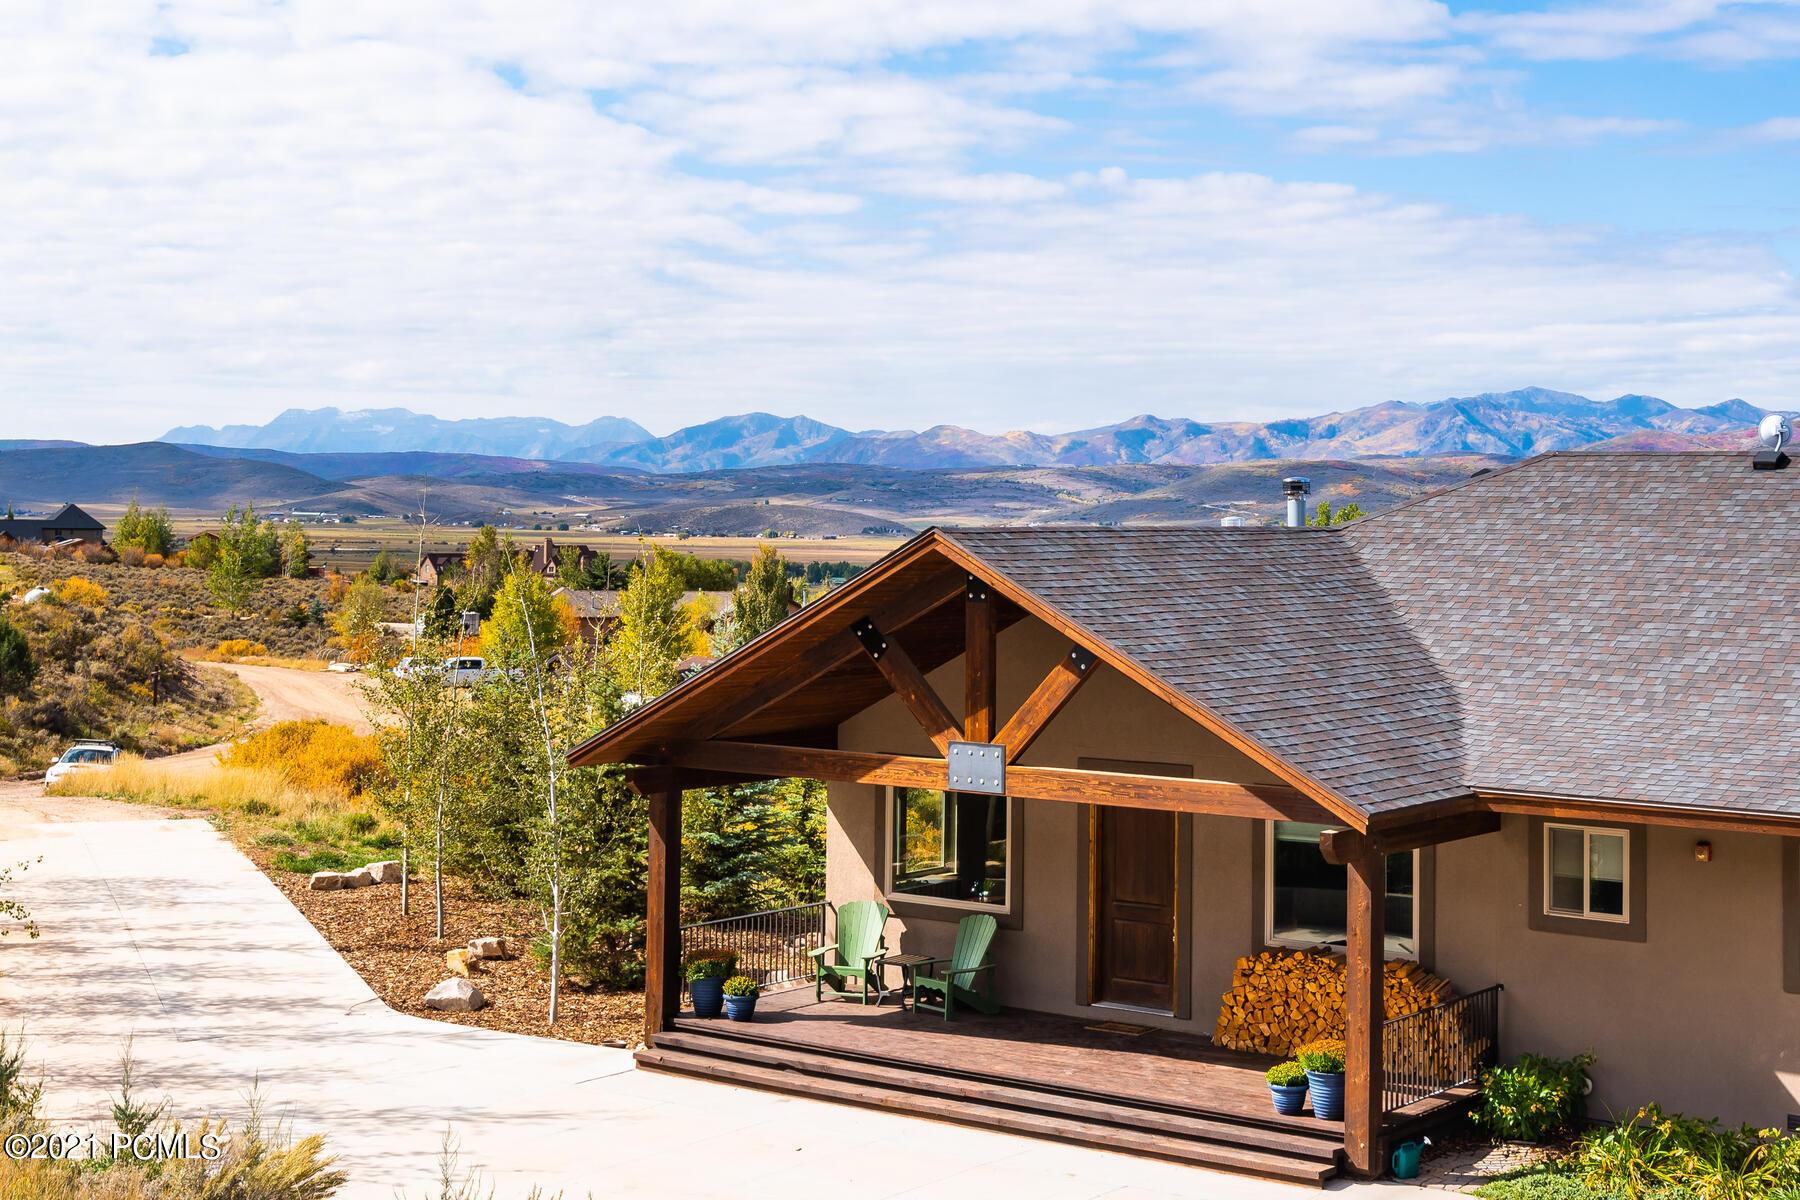 1964 Splendor Valley Road, Kamas, Utah 84036, 5 Bedrooms Bedrooms, ,5 BathroomsBathrooms,Single Family,For Sale,Splendor Valley,12104256